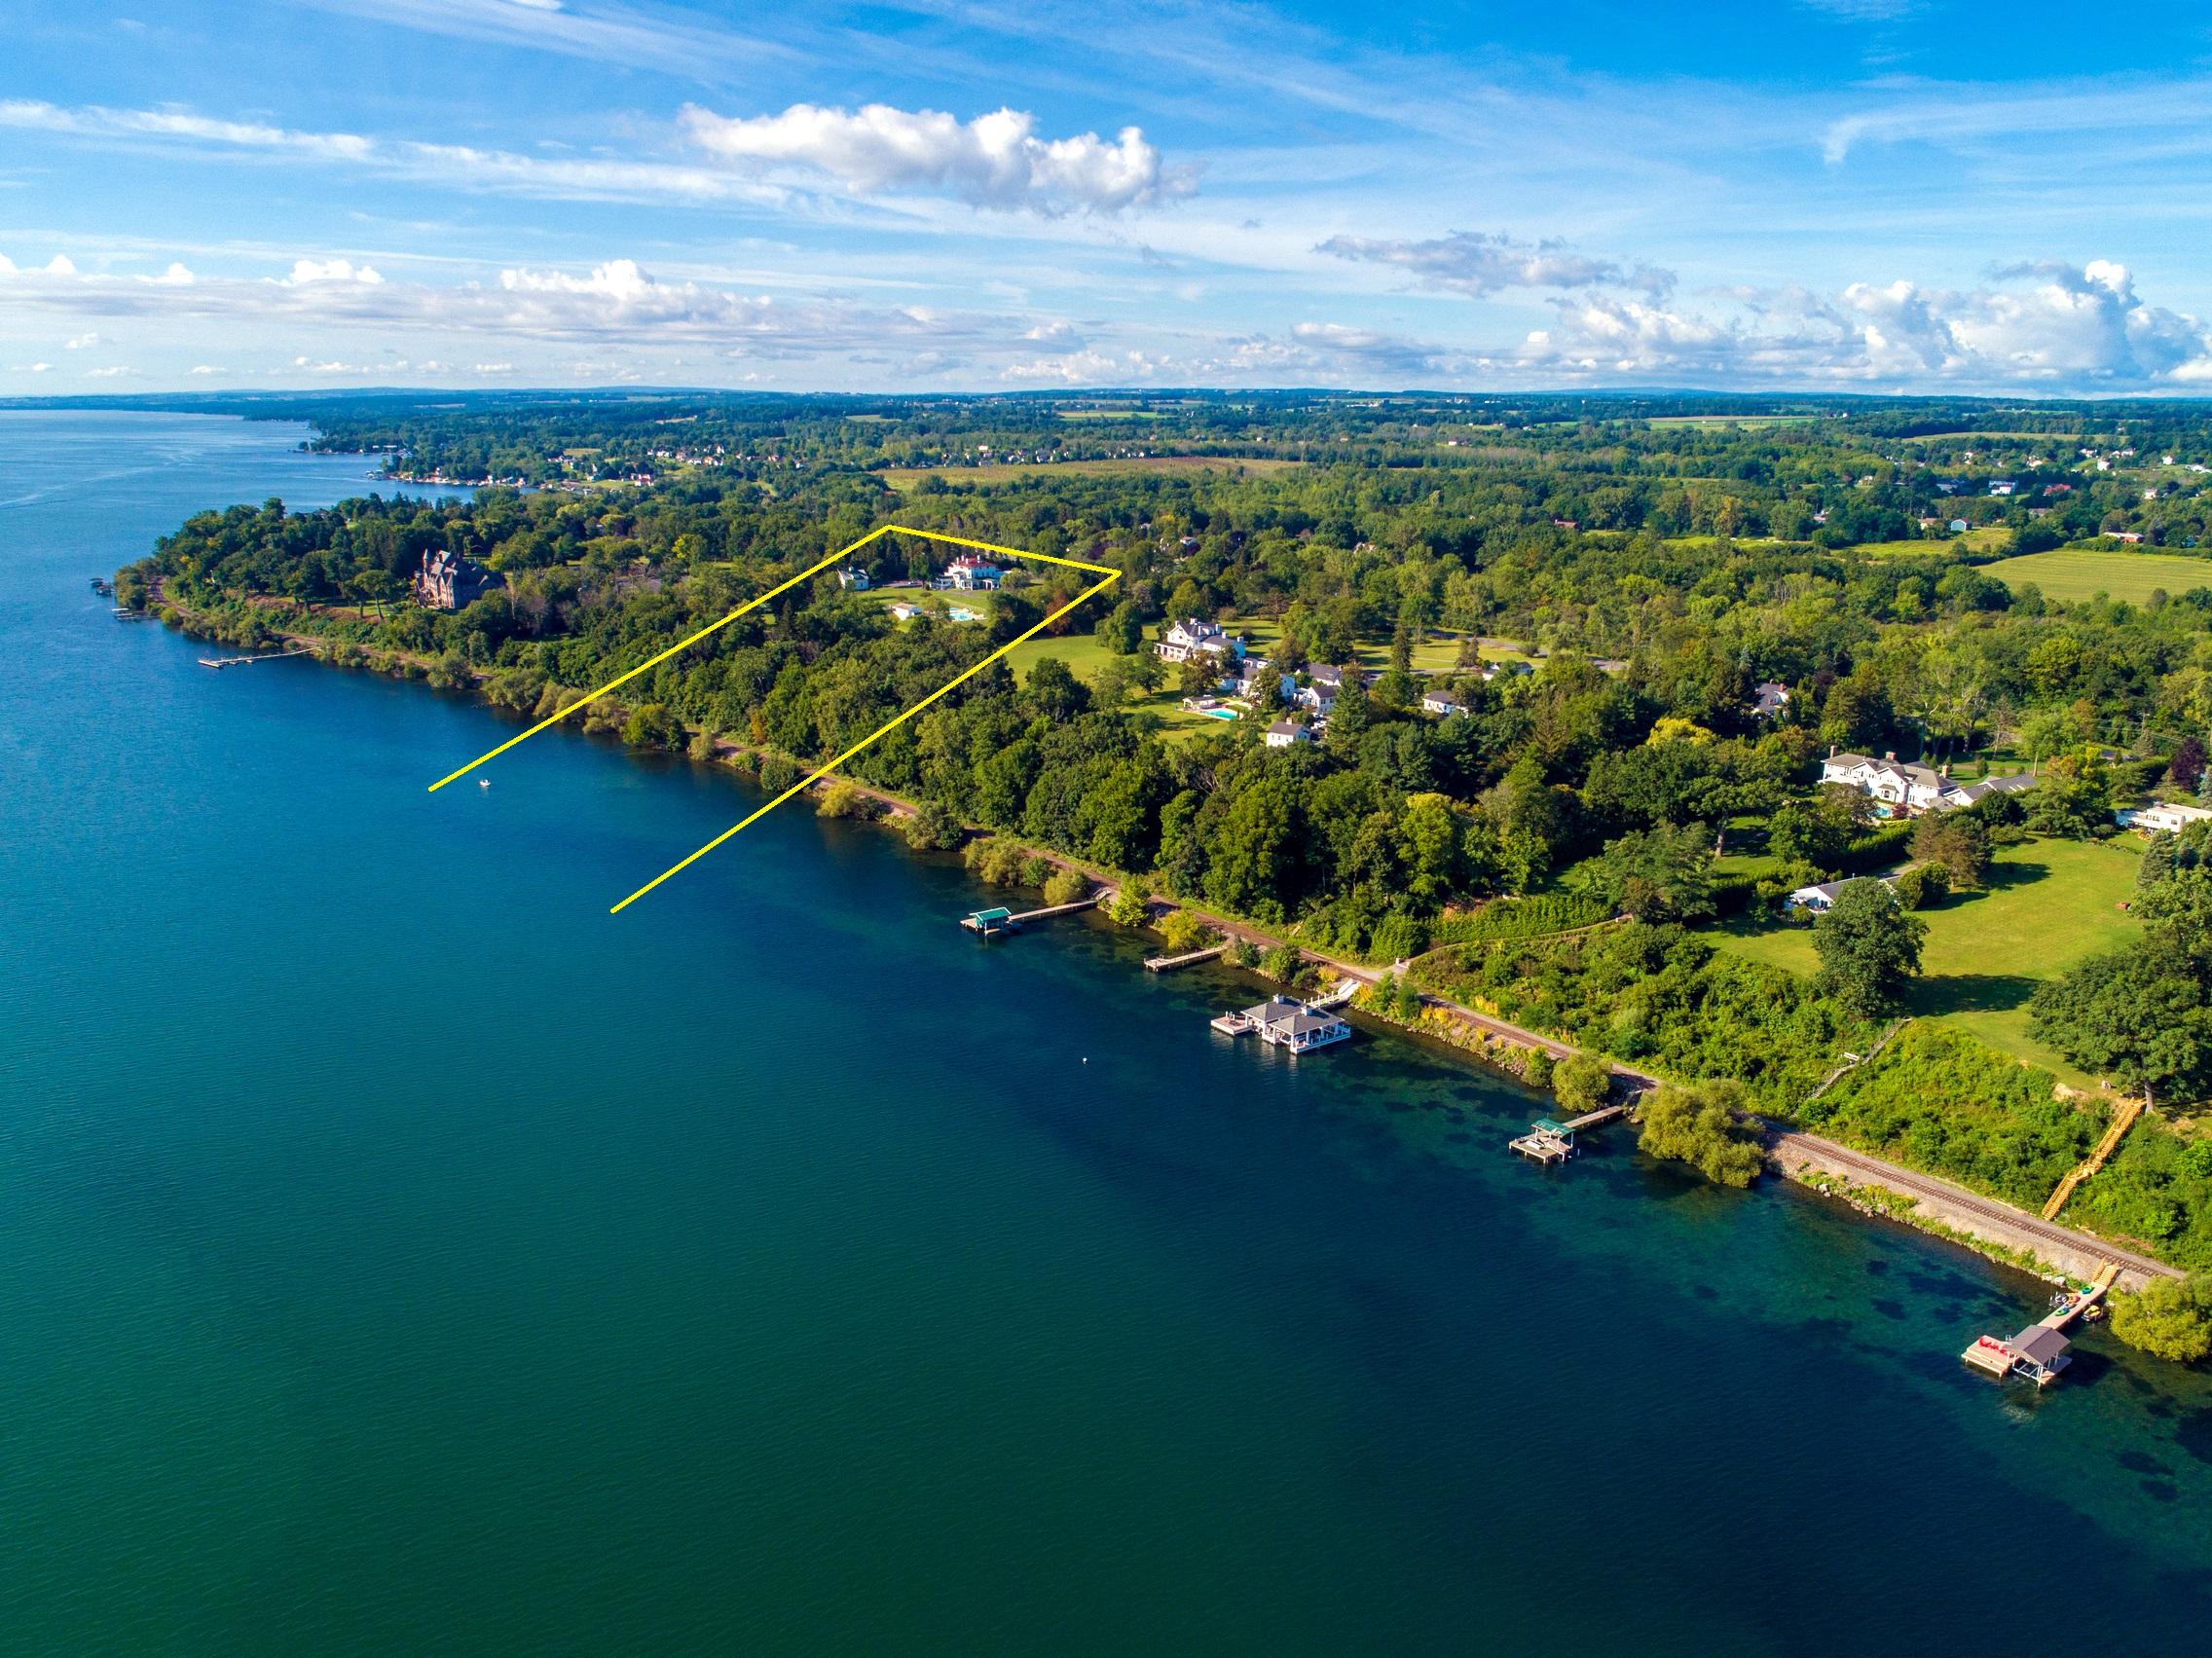 7  Seneca Lake Auction, American Legion, 1115 Lochland Rd, Geneva, NY 14456, Seneca Lake, Finger Lakes Property Listed For Sale by Michael DeRosa, Real Estate Broker, Michael DeRosa Exchange.jpg